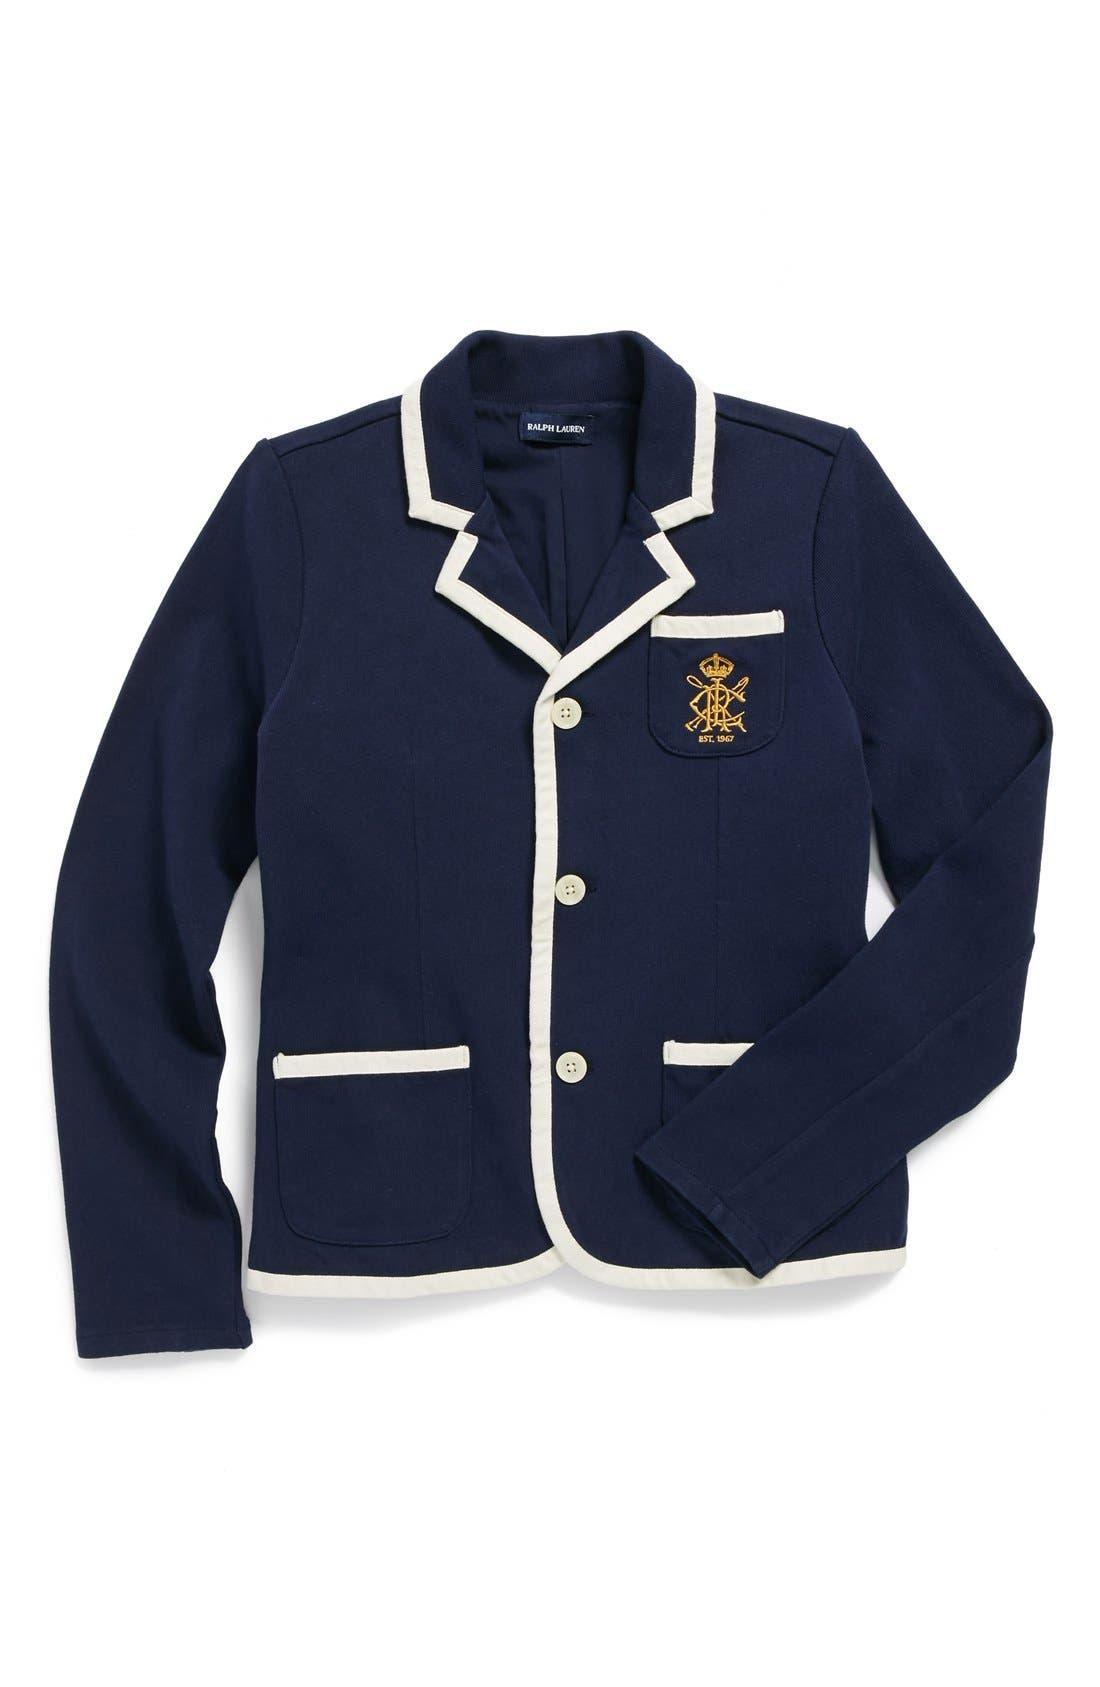 Alternate Image 1 Selected - Ralph Lauren Knit Jersey Blazer (Big Girls)